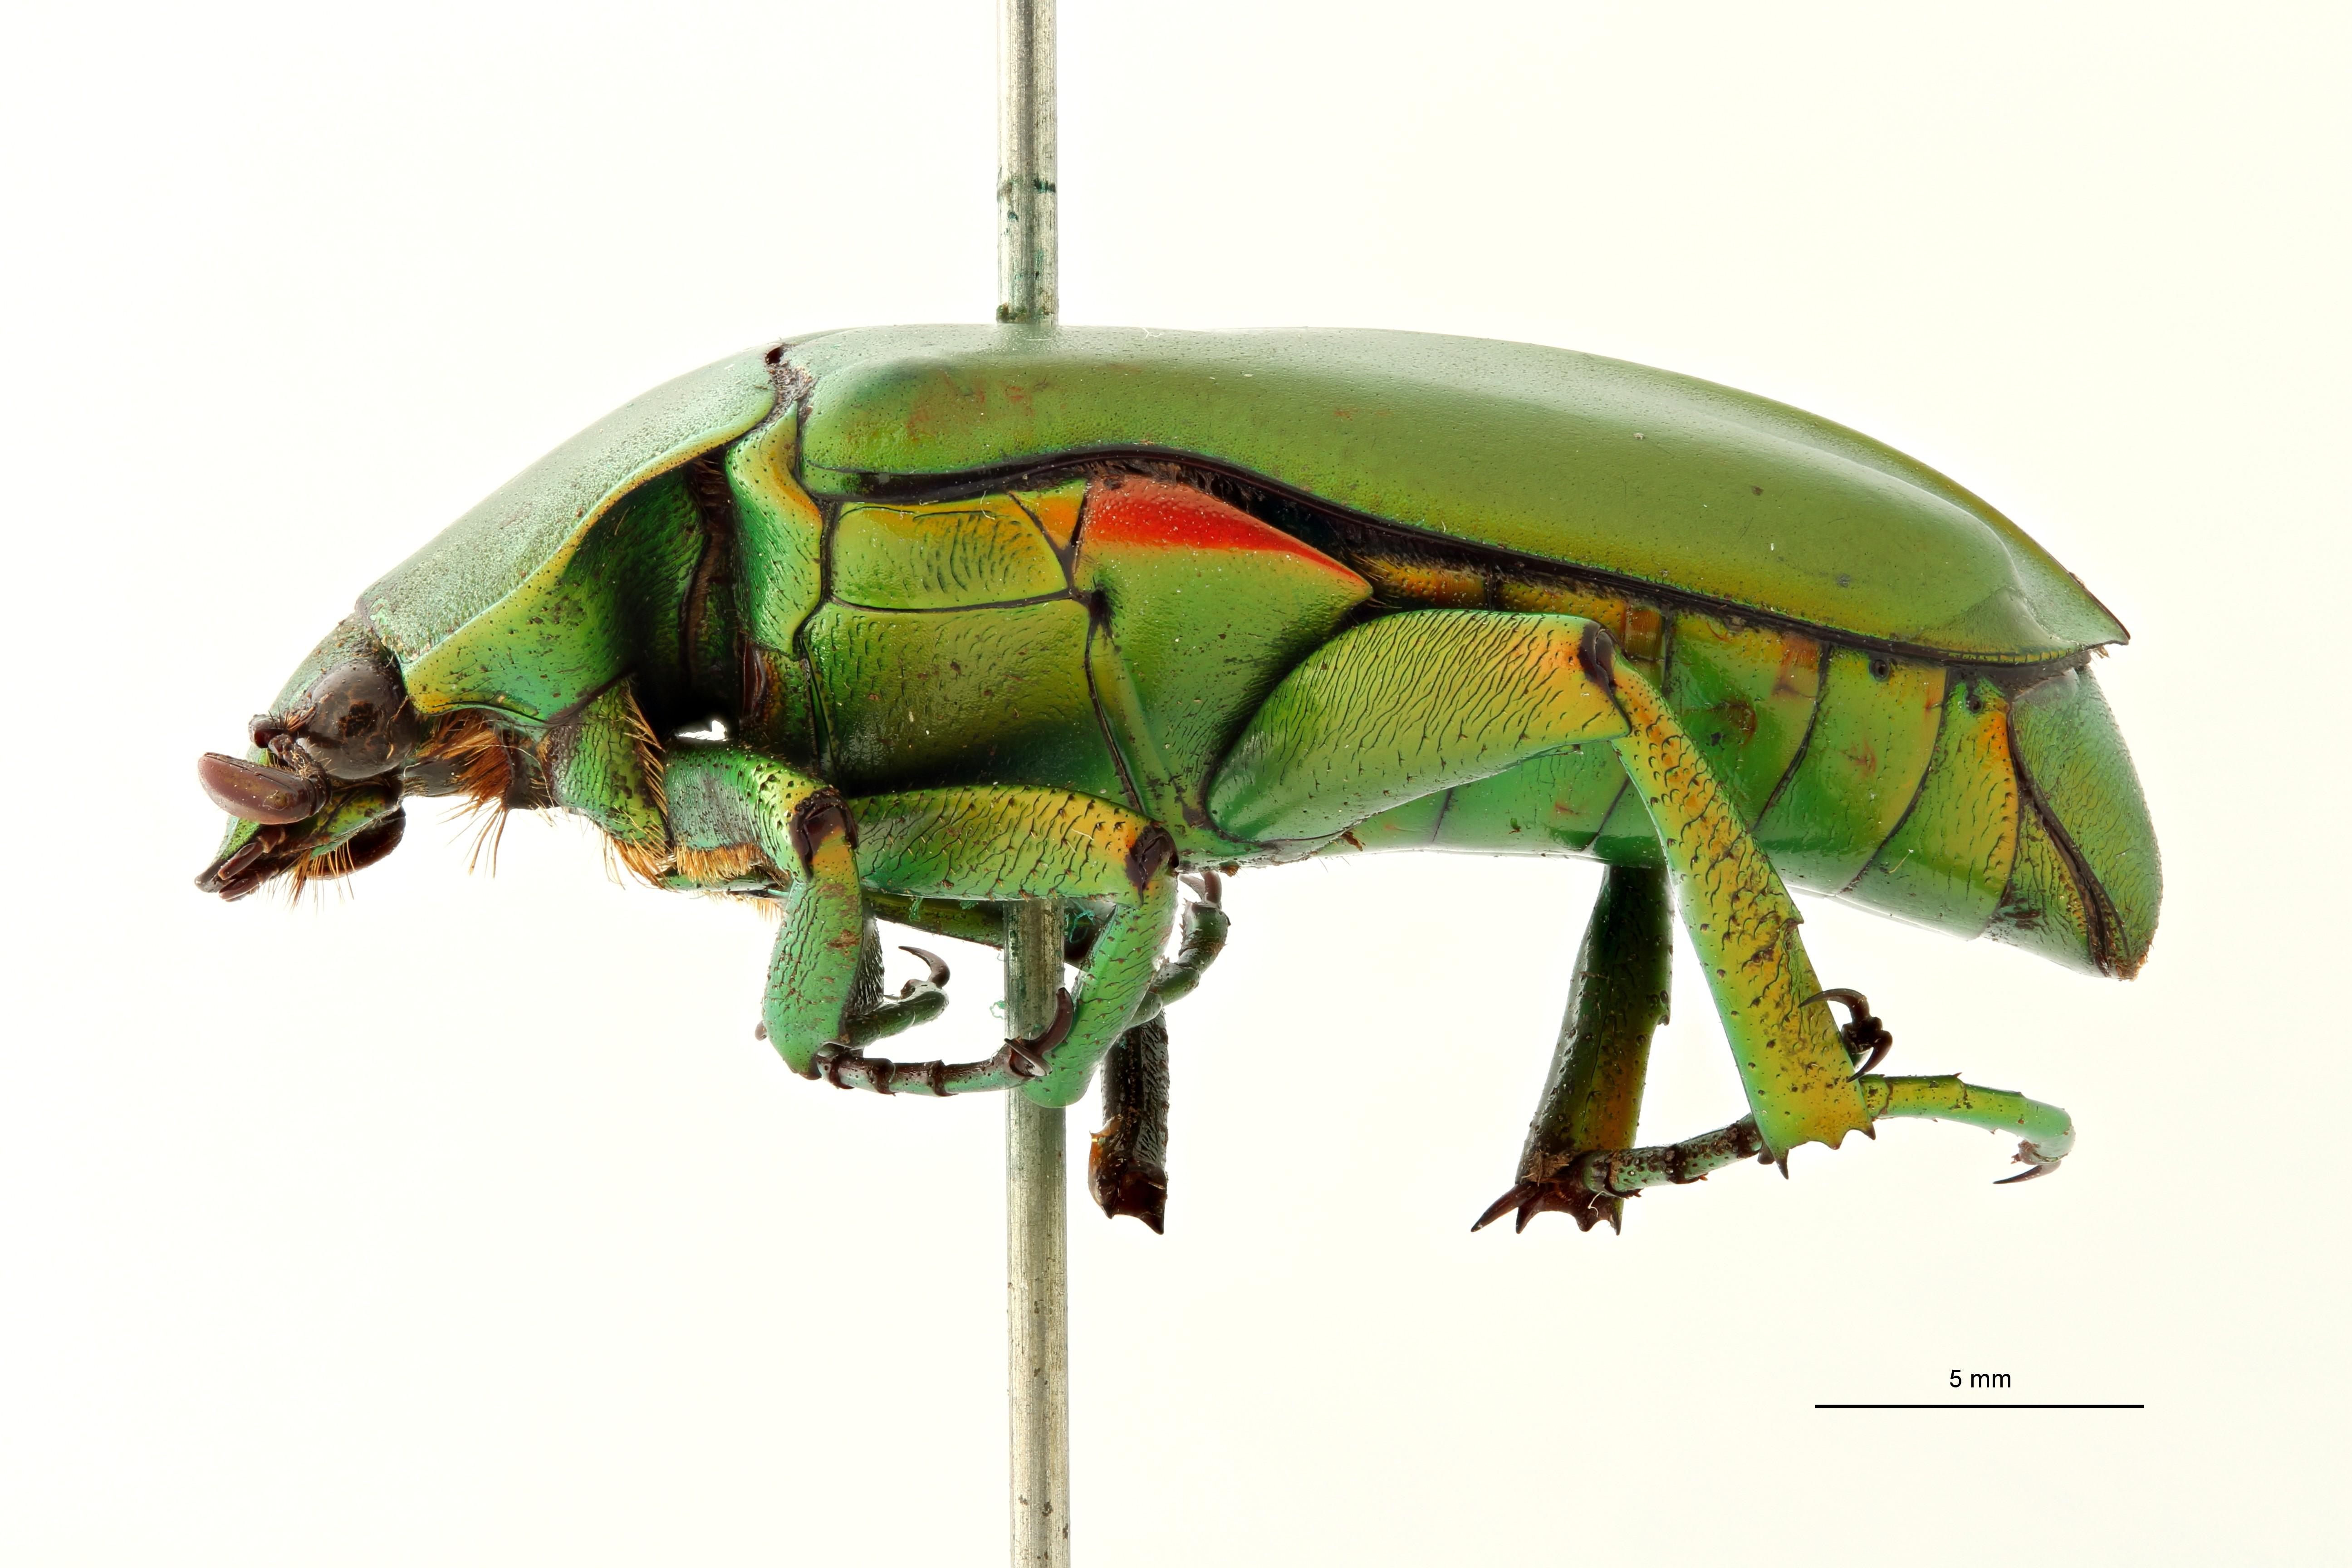 Caelorrhina gracilipes lt L ZS PMax Scaled.jpeg